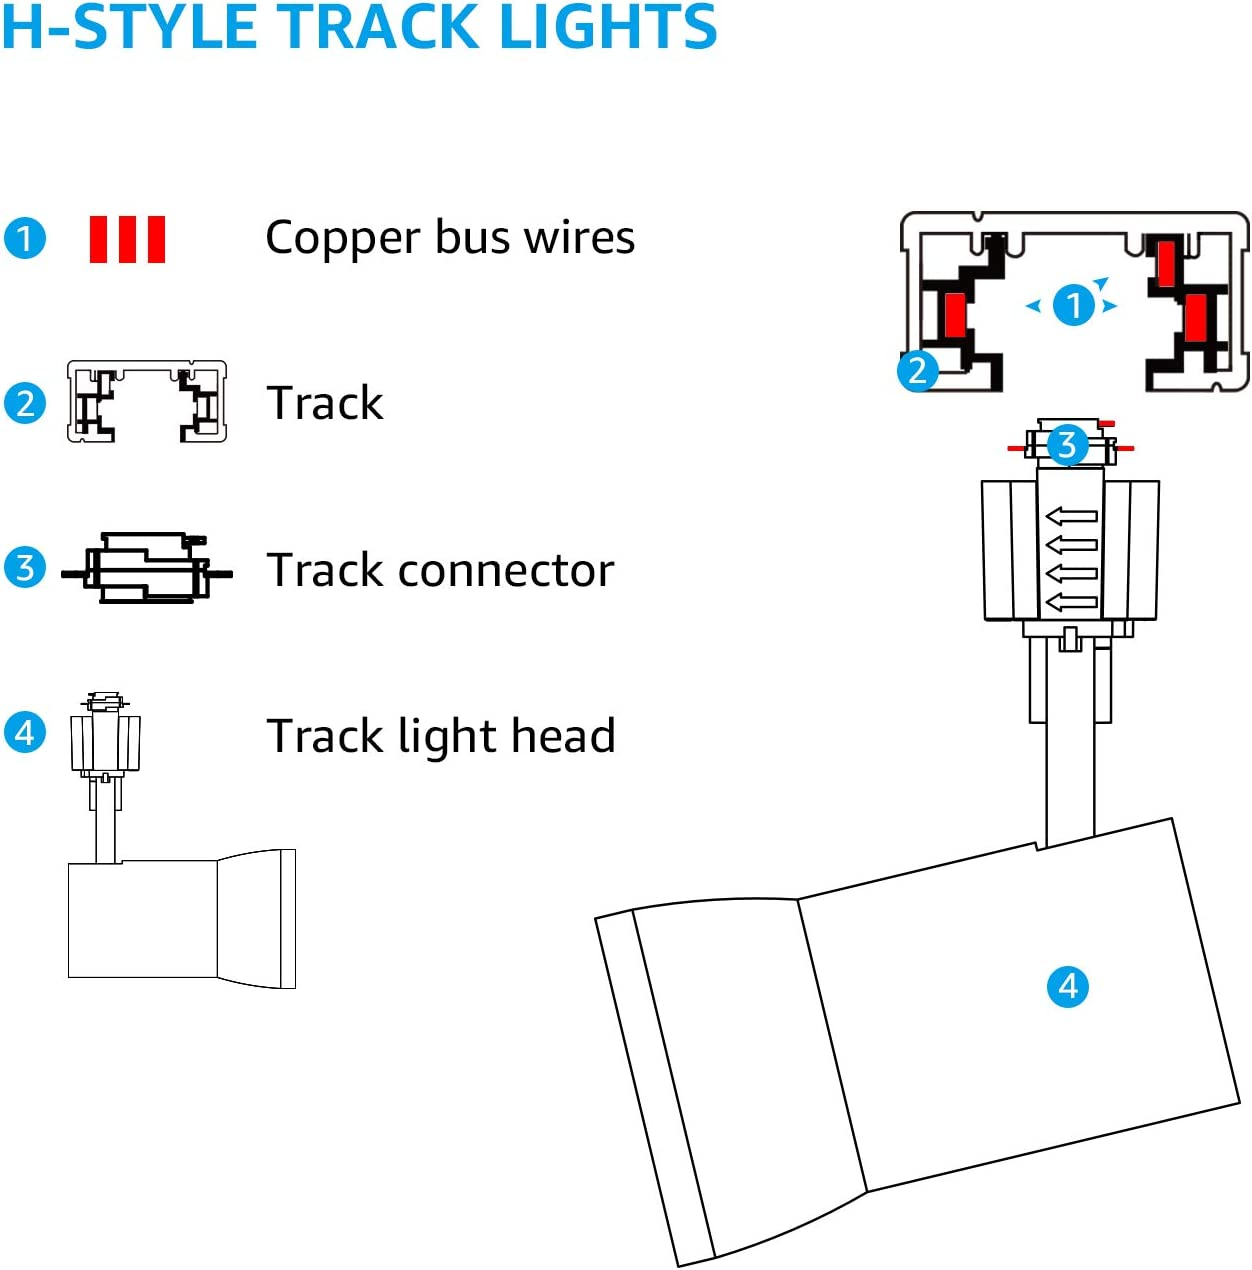 for Wall Exhibition Lighting 4000K Cool White H Type Spotlight 700lm Dimmable CRI90+ 5 Years Warranty Energy Star /& ETL Listed Pack of 2 White LEONLITE 10W Aluminum LED Track Lighting Heads